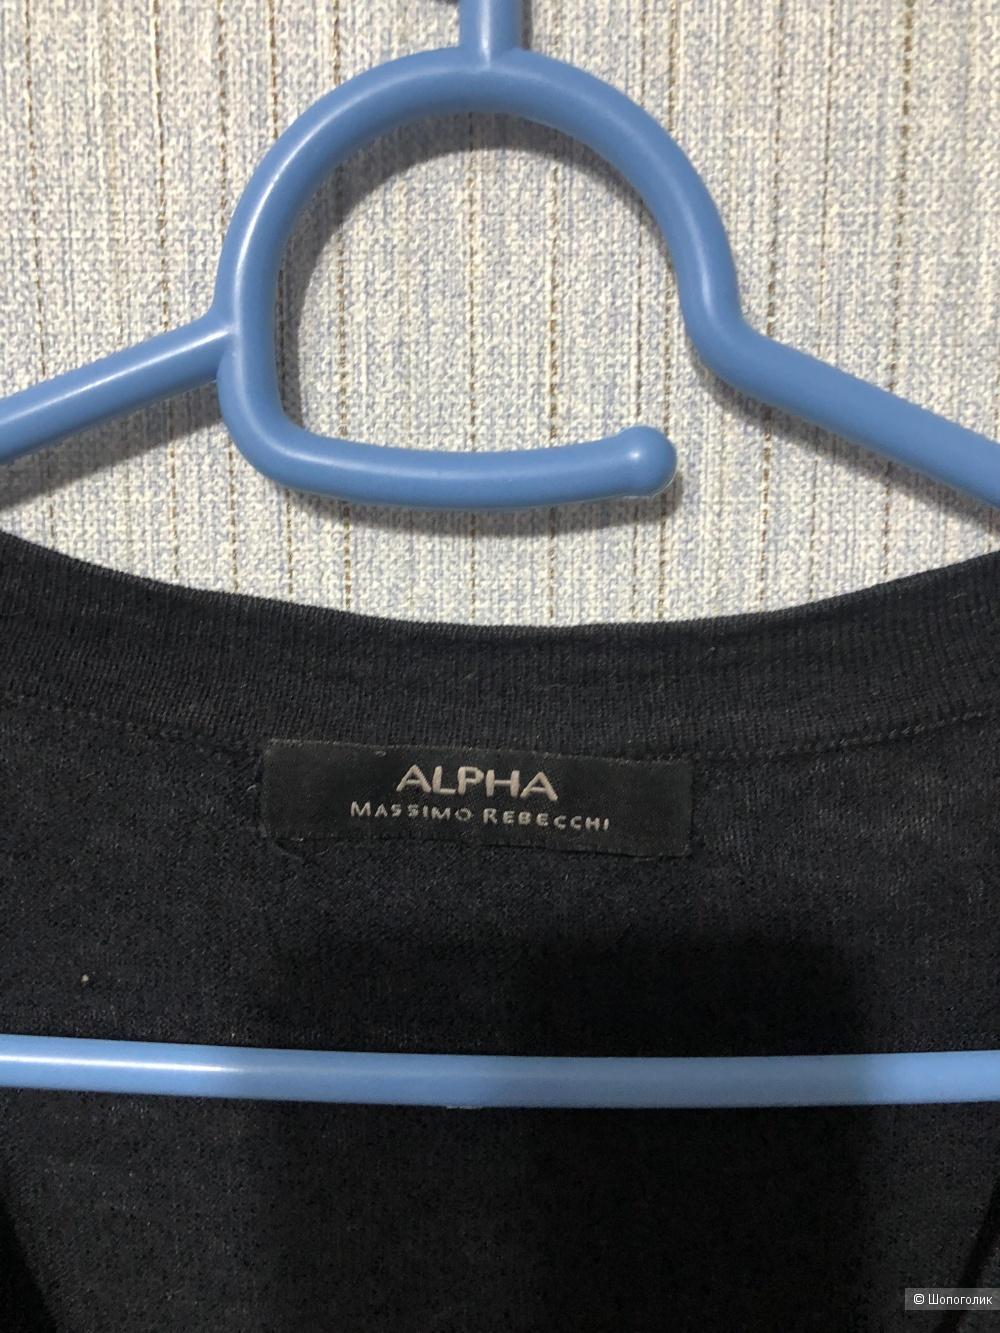 Кардиган Alpha Massimo Rebecchi размер 40/42/44